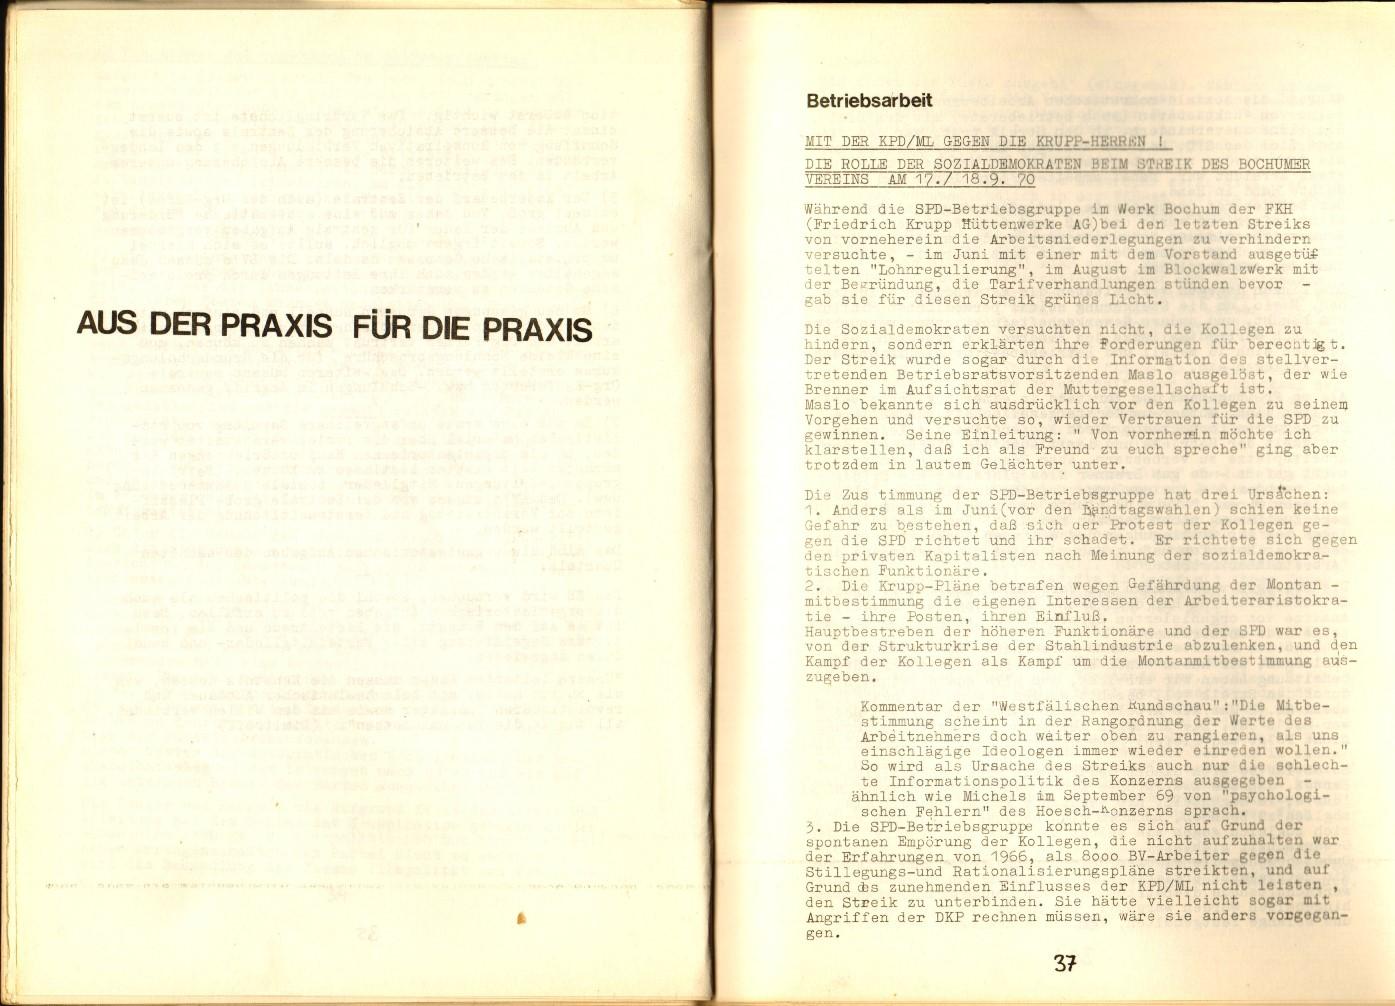 ZB_Parteiarbeiter_1970_03_23